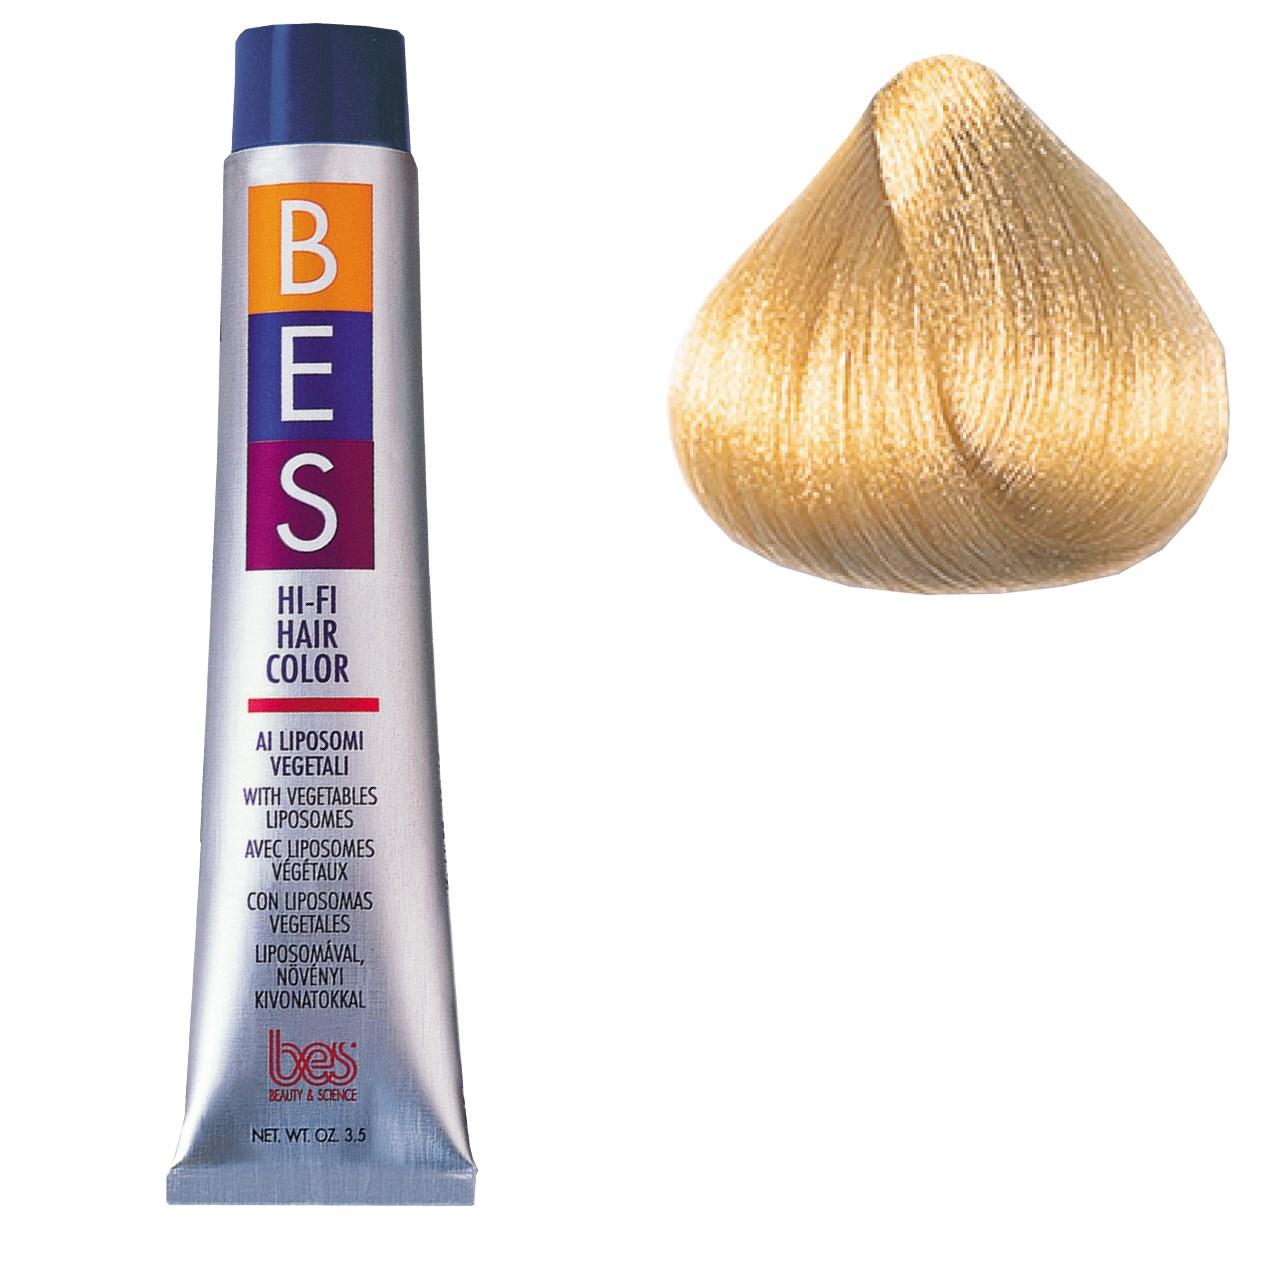 رنگ موی بس سری Golden مدل Ultra Light Golden Blonde شماره 10.3